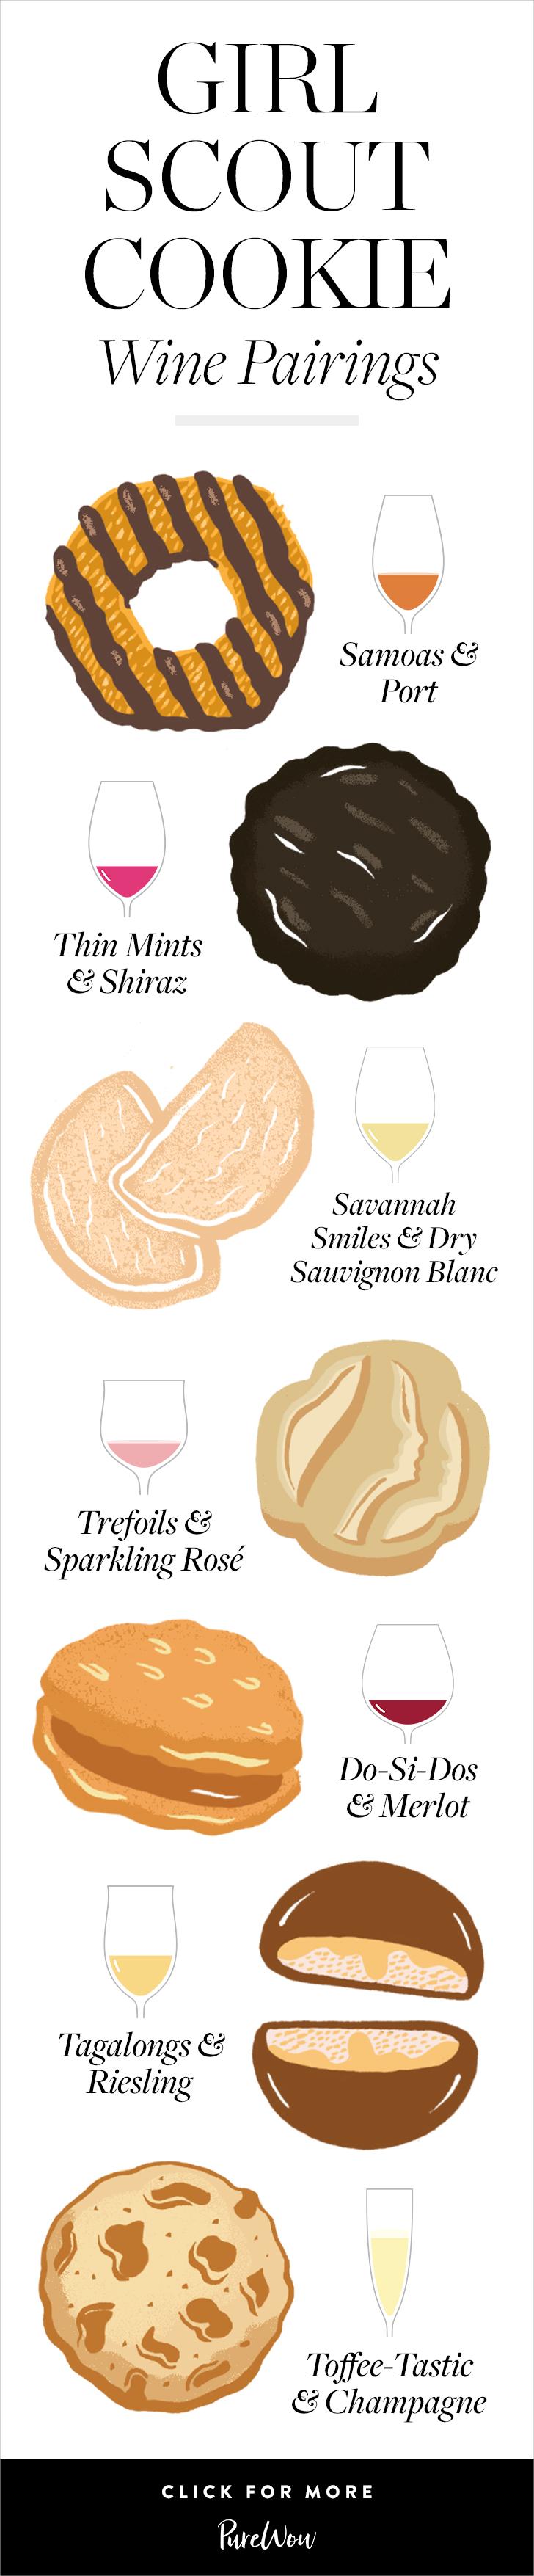 Girl Scout Cookie Wine Pairings.png